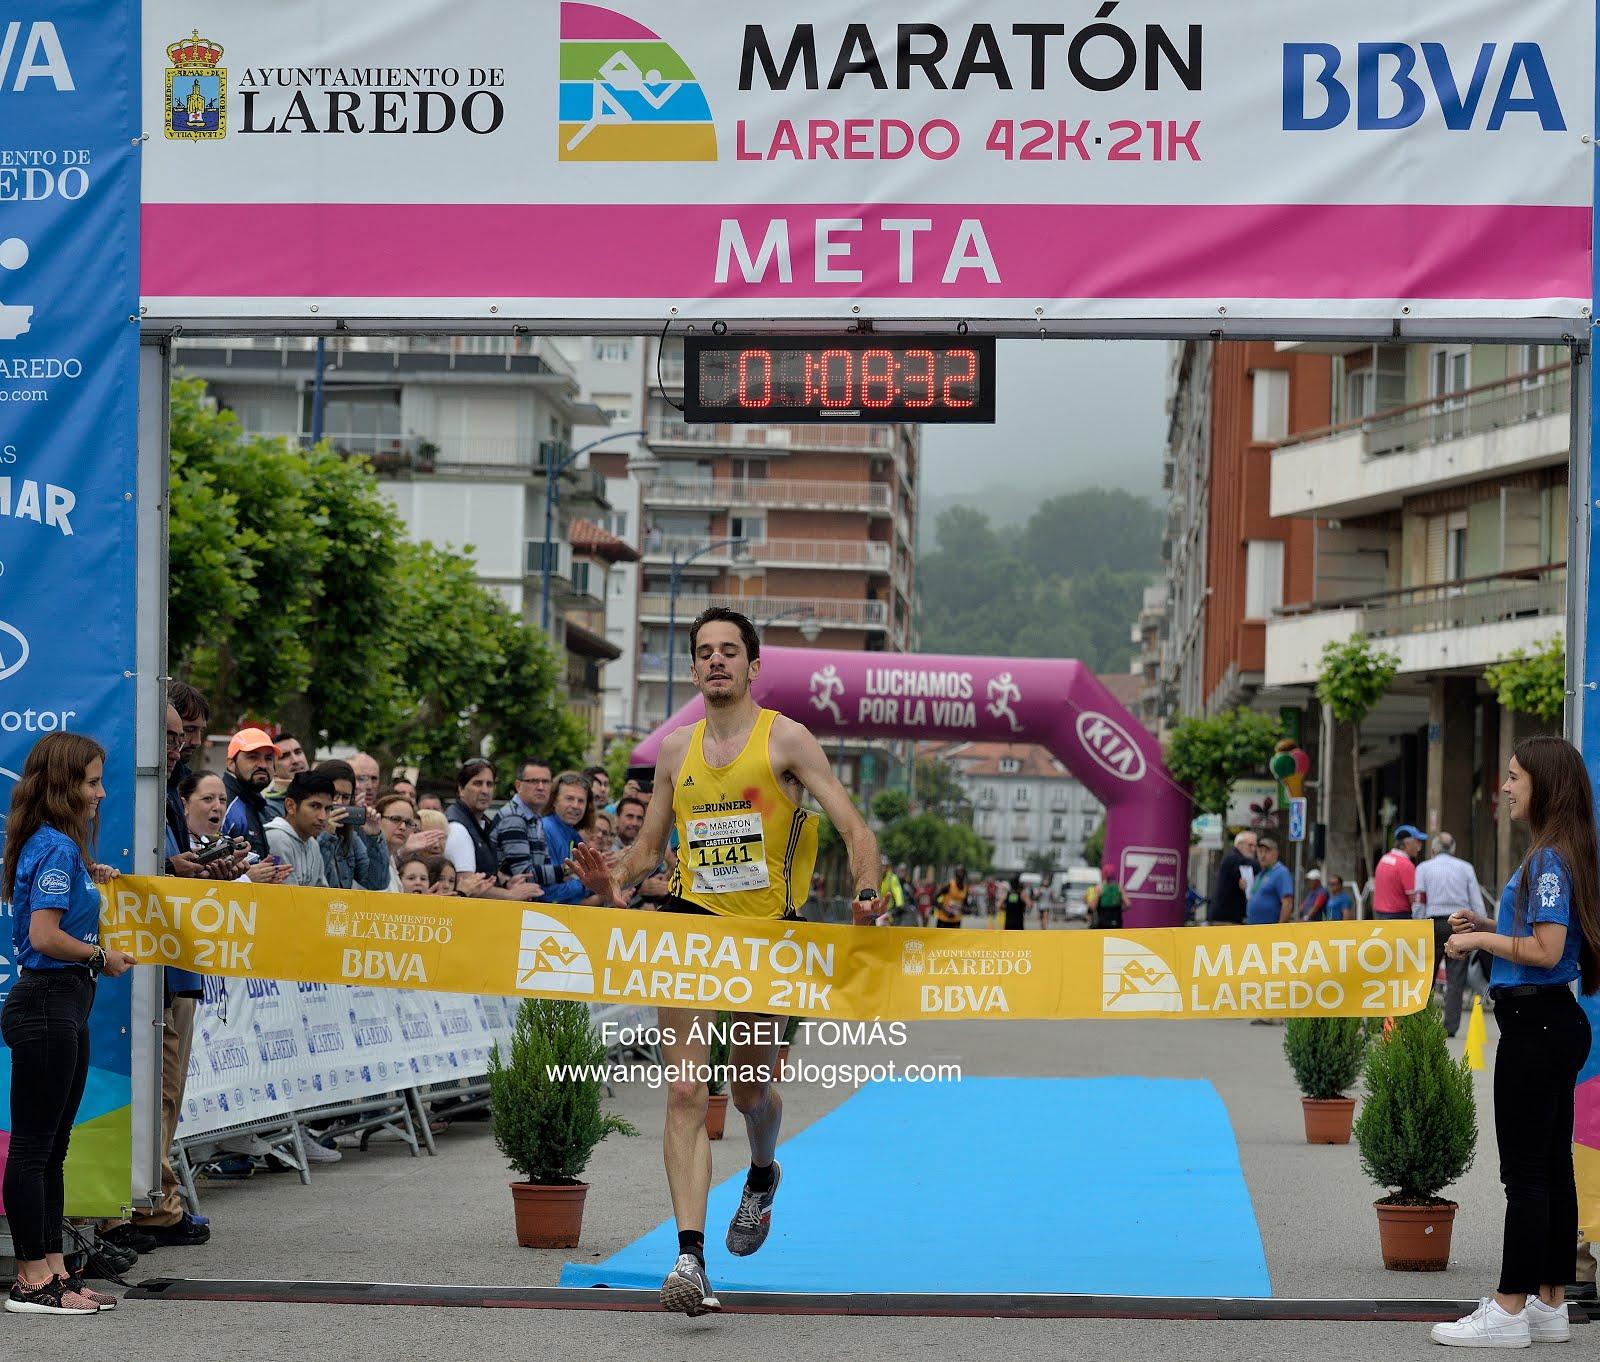 Maraton Laredo 2018 FOTO ANGEL TOMAS _AT56307